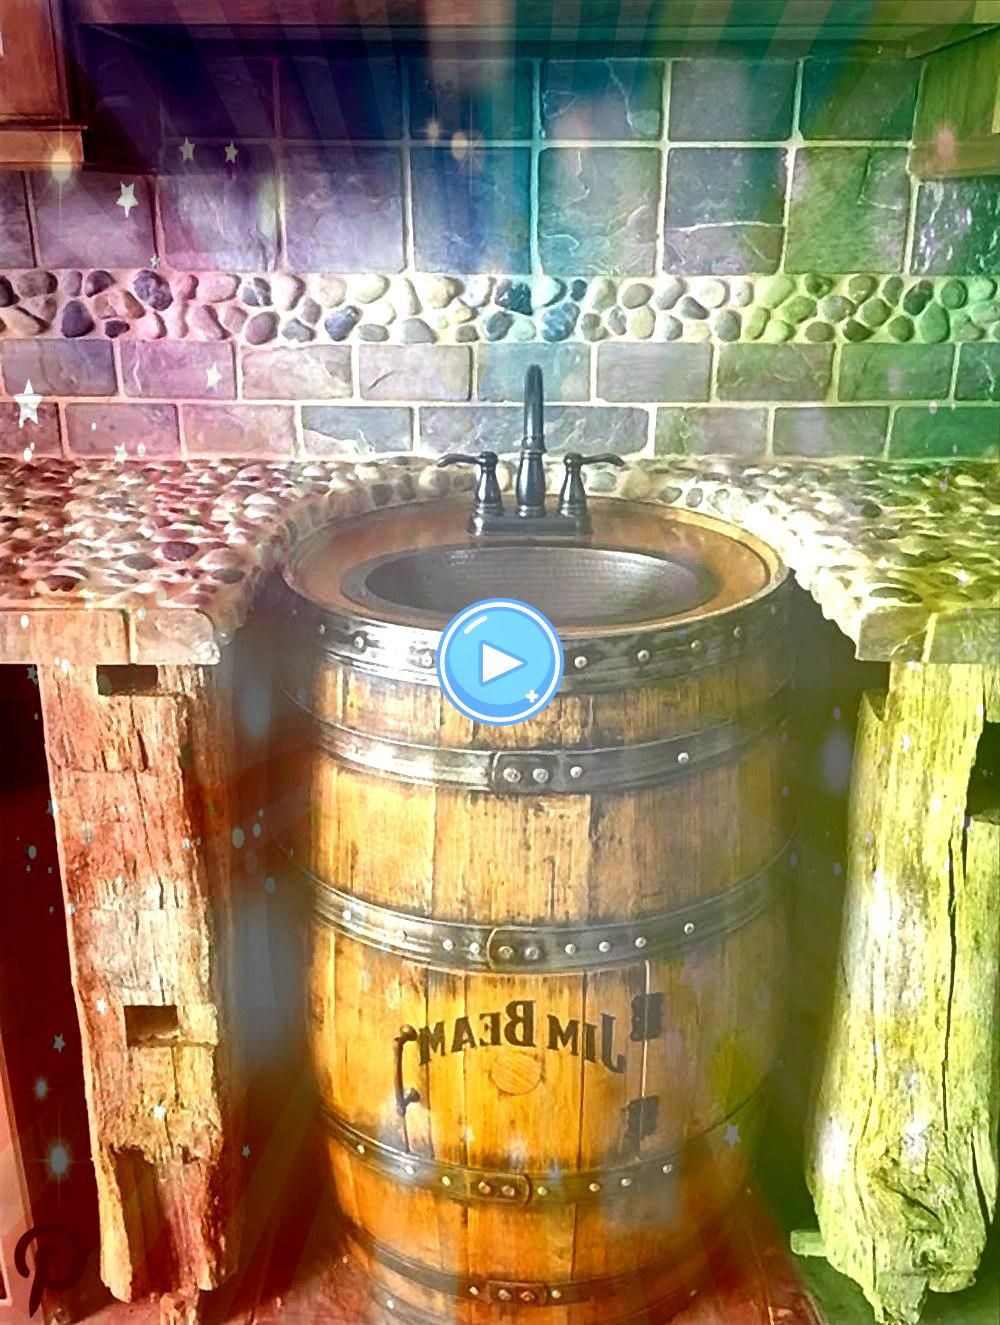 barrel sink hammered copper rustic antique bathroom  bar  man cave vanity wine oak ba Whiskey barrel sink hammered copper rustic antique bathroom  bar  man cave vanity wi...